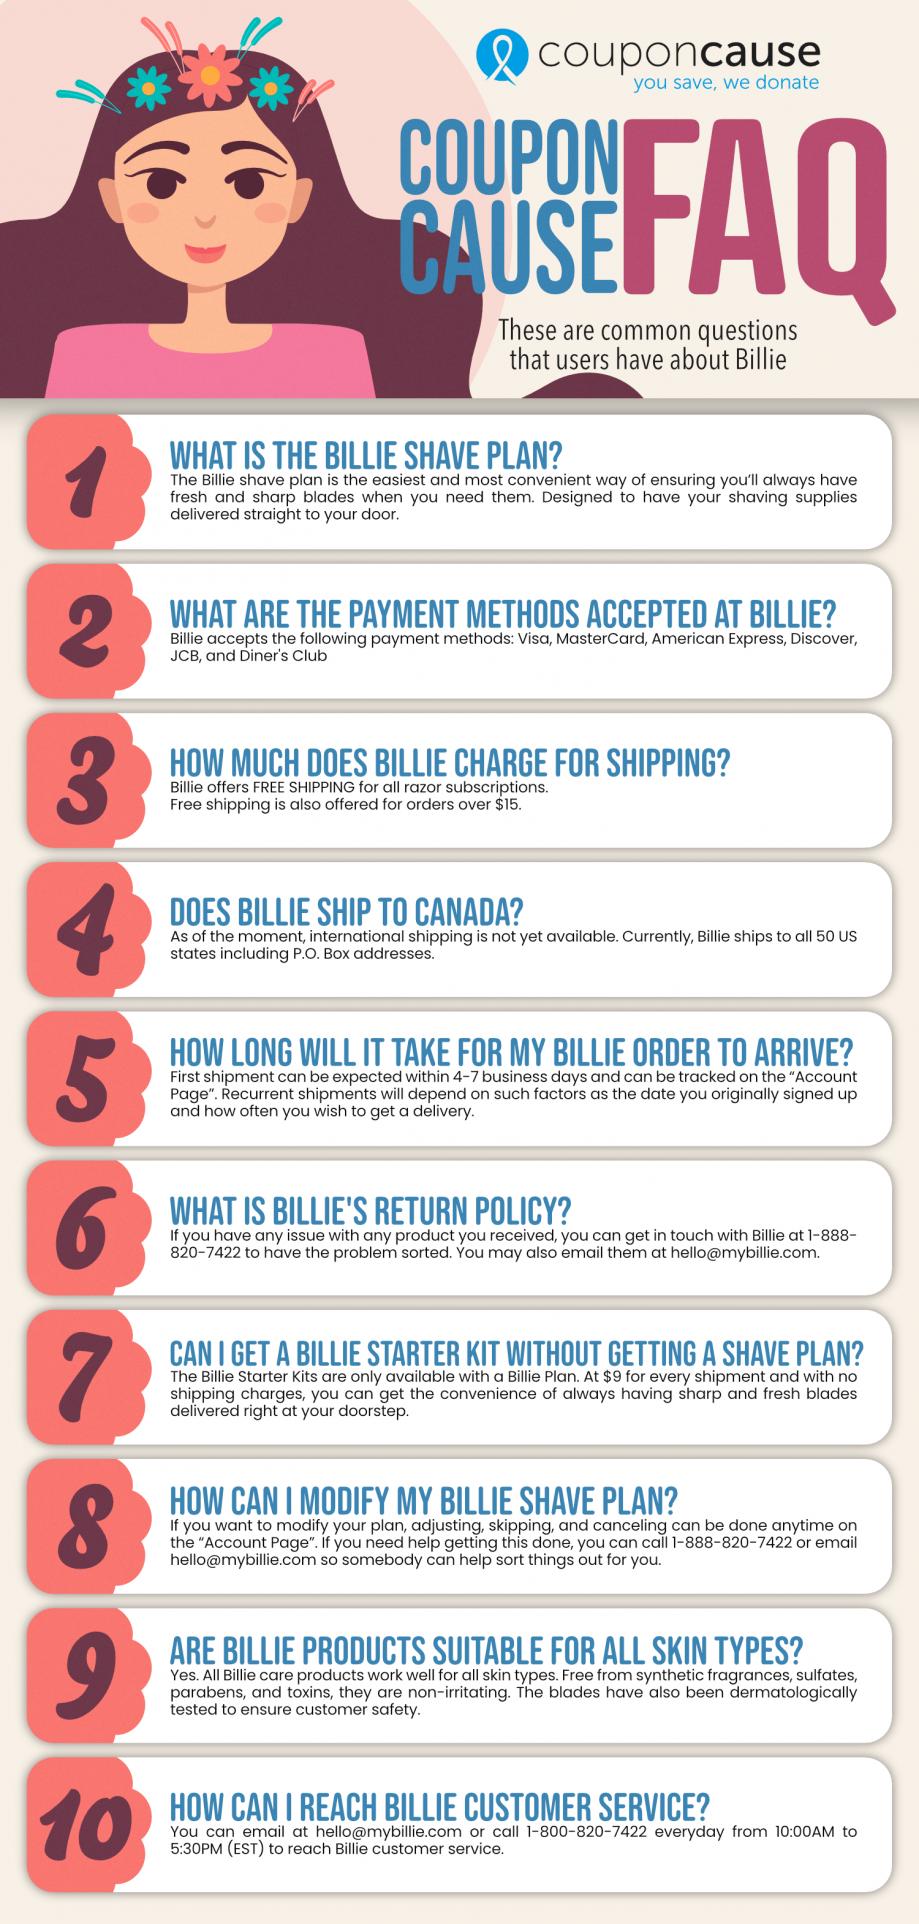 Billie Coupon Cause FAQ (C.C. FAQ)